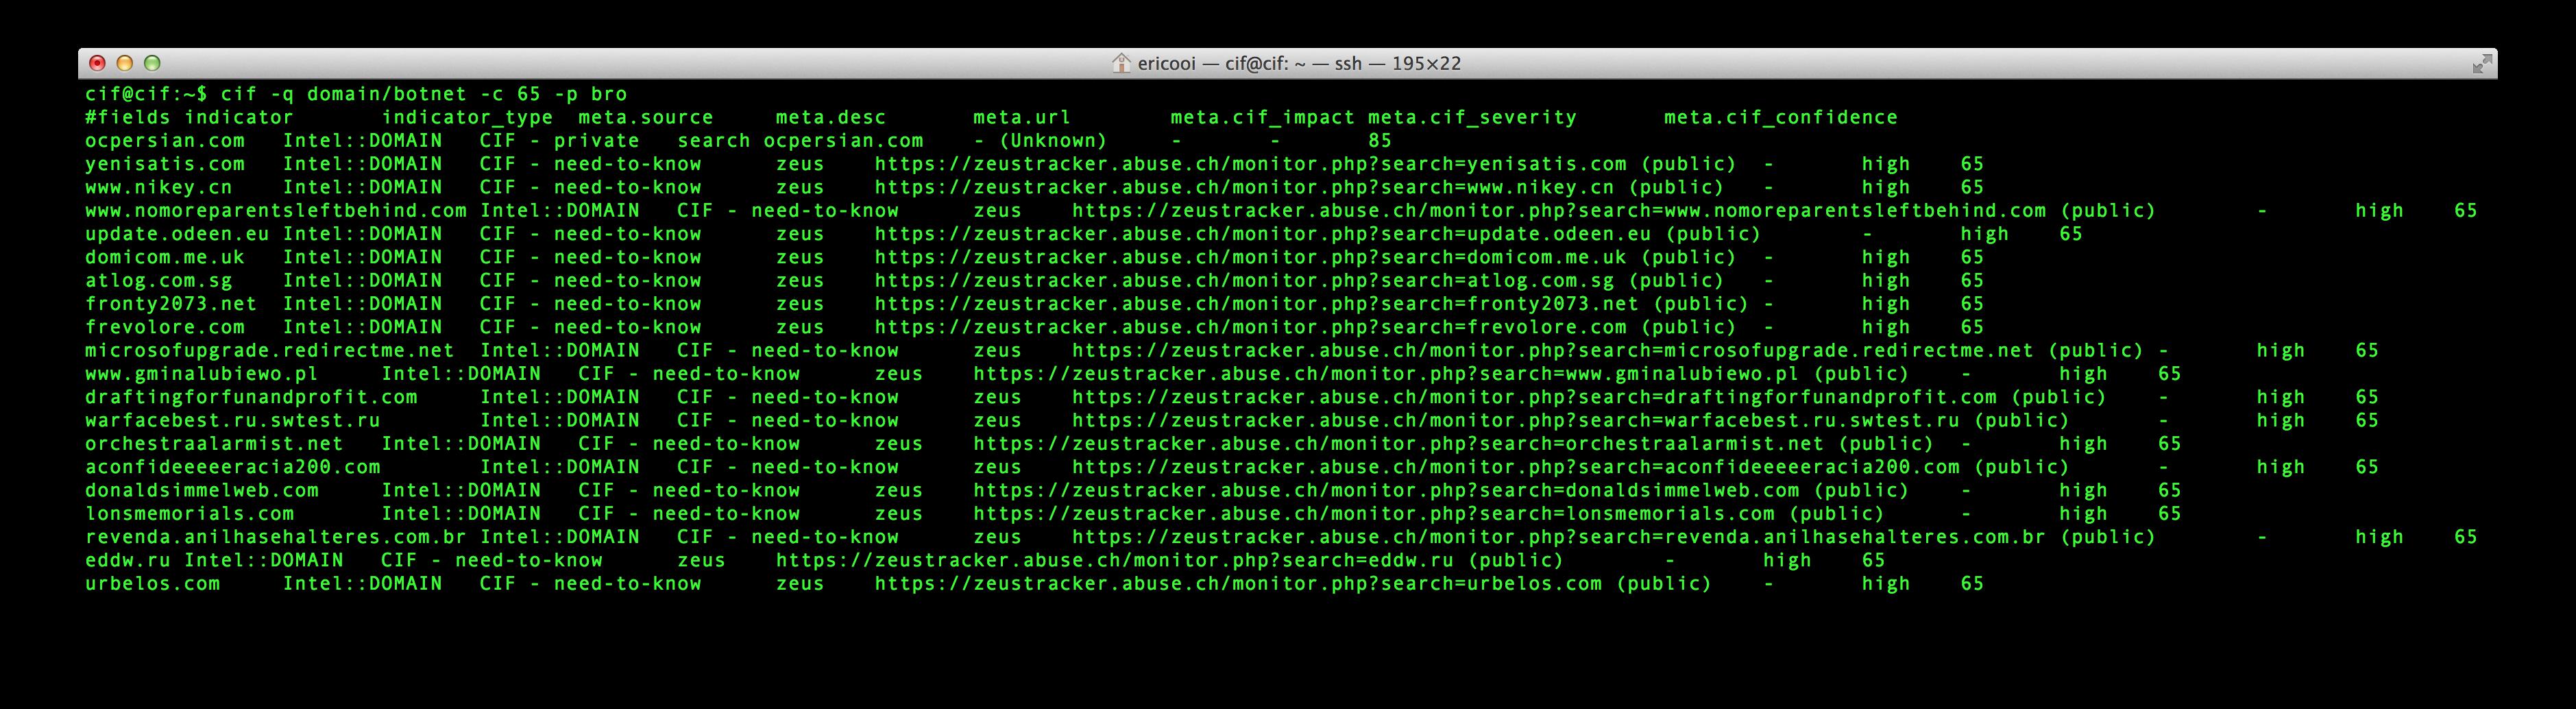 Botnets (Bro): cif -q domain/botnet -c 65 -p bro